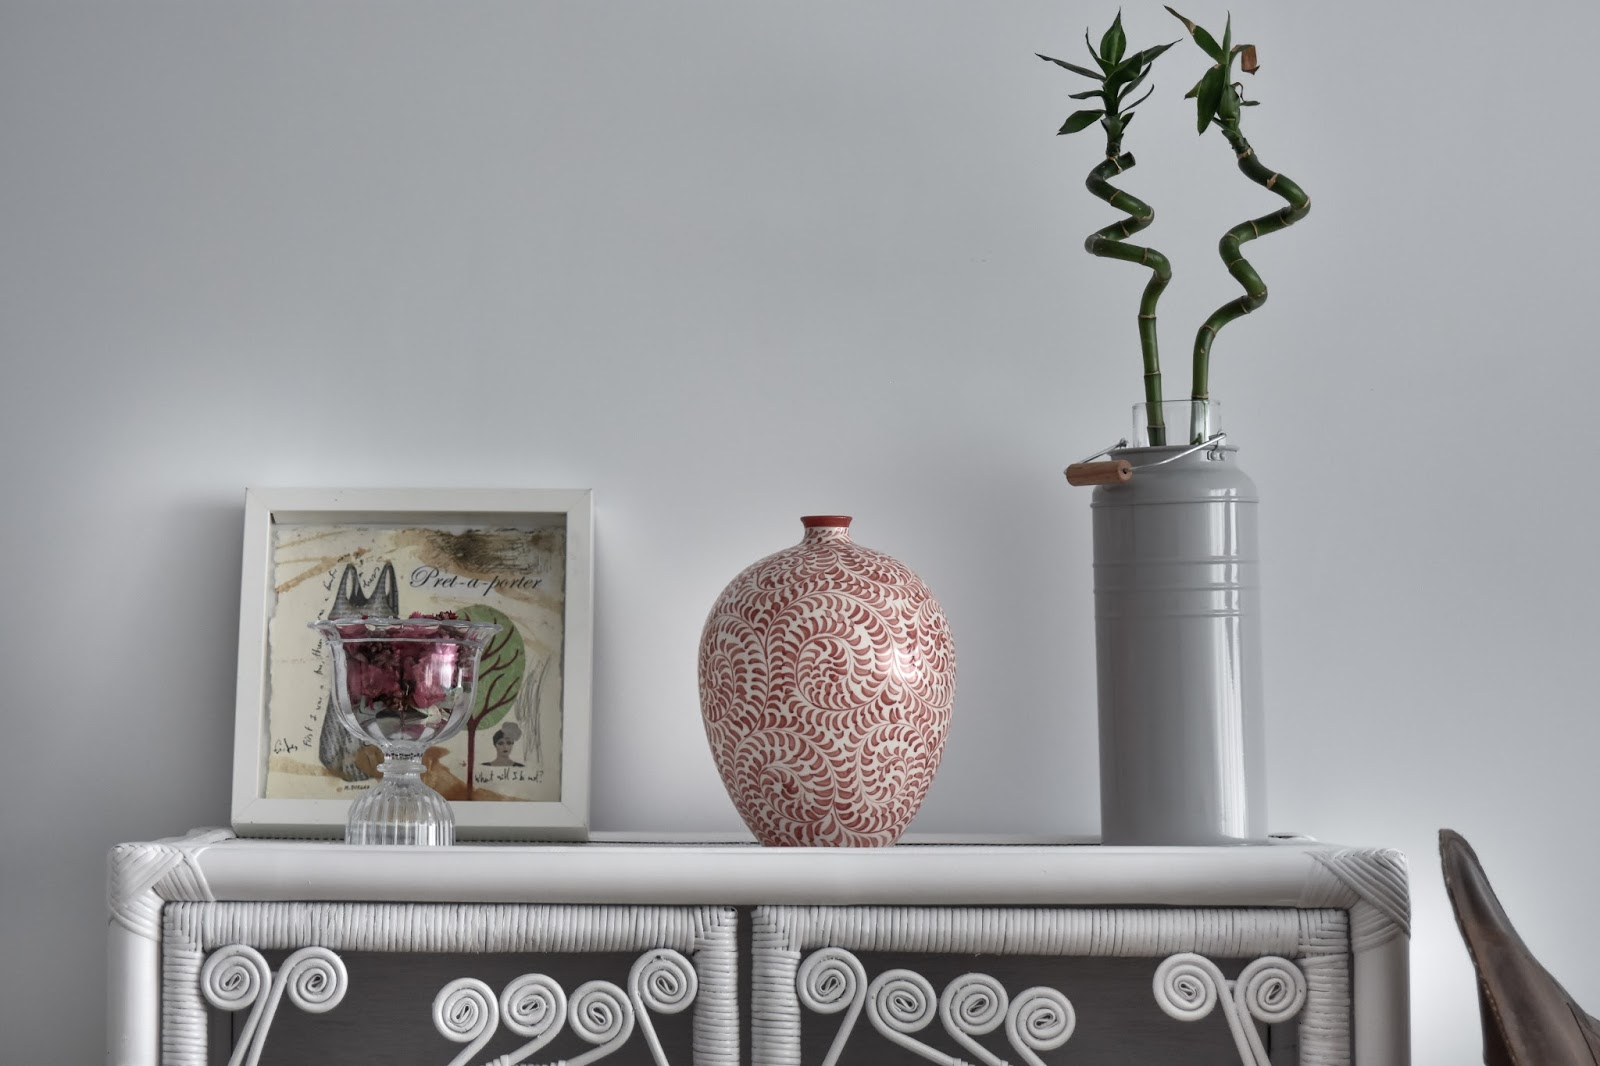 latest deco cosy chic deco living room sklum cosy style el blog de silvia rodriguez with cuisine. Black Bedroom Furniture Sets. Home Design Ideas